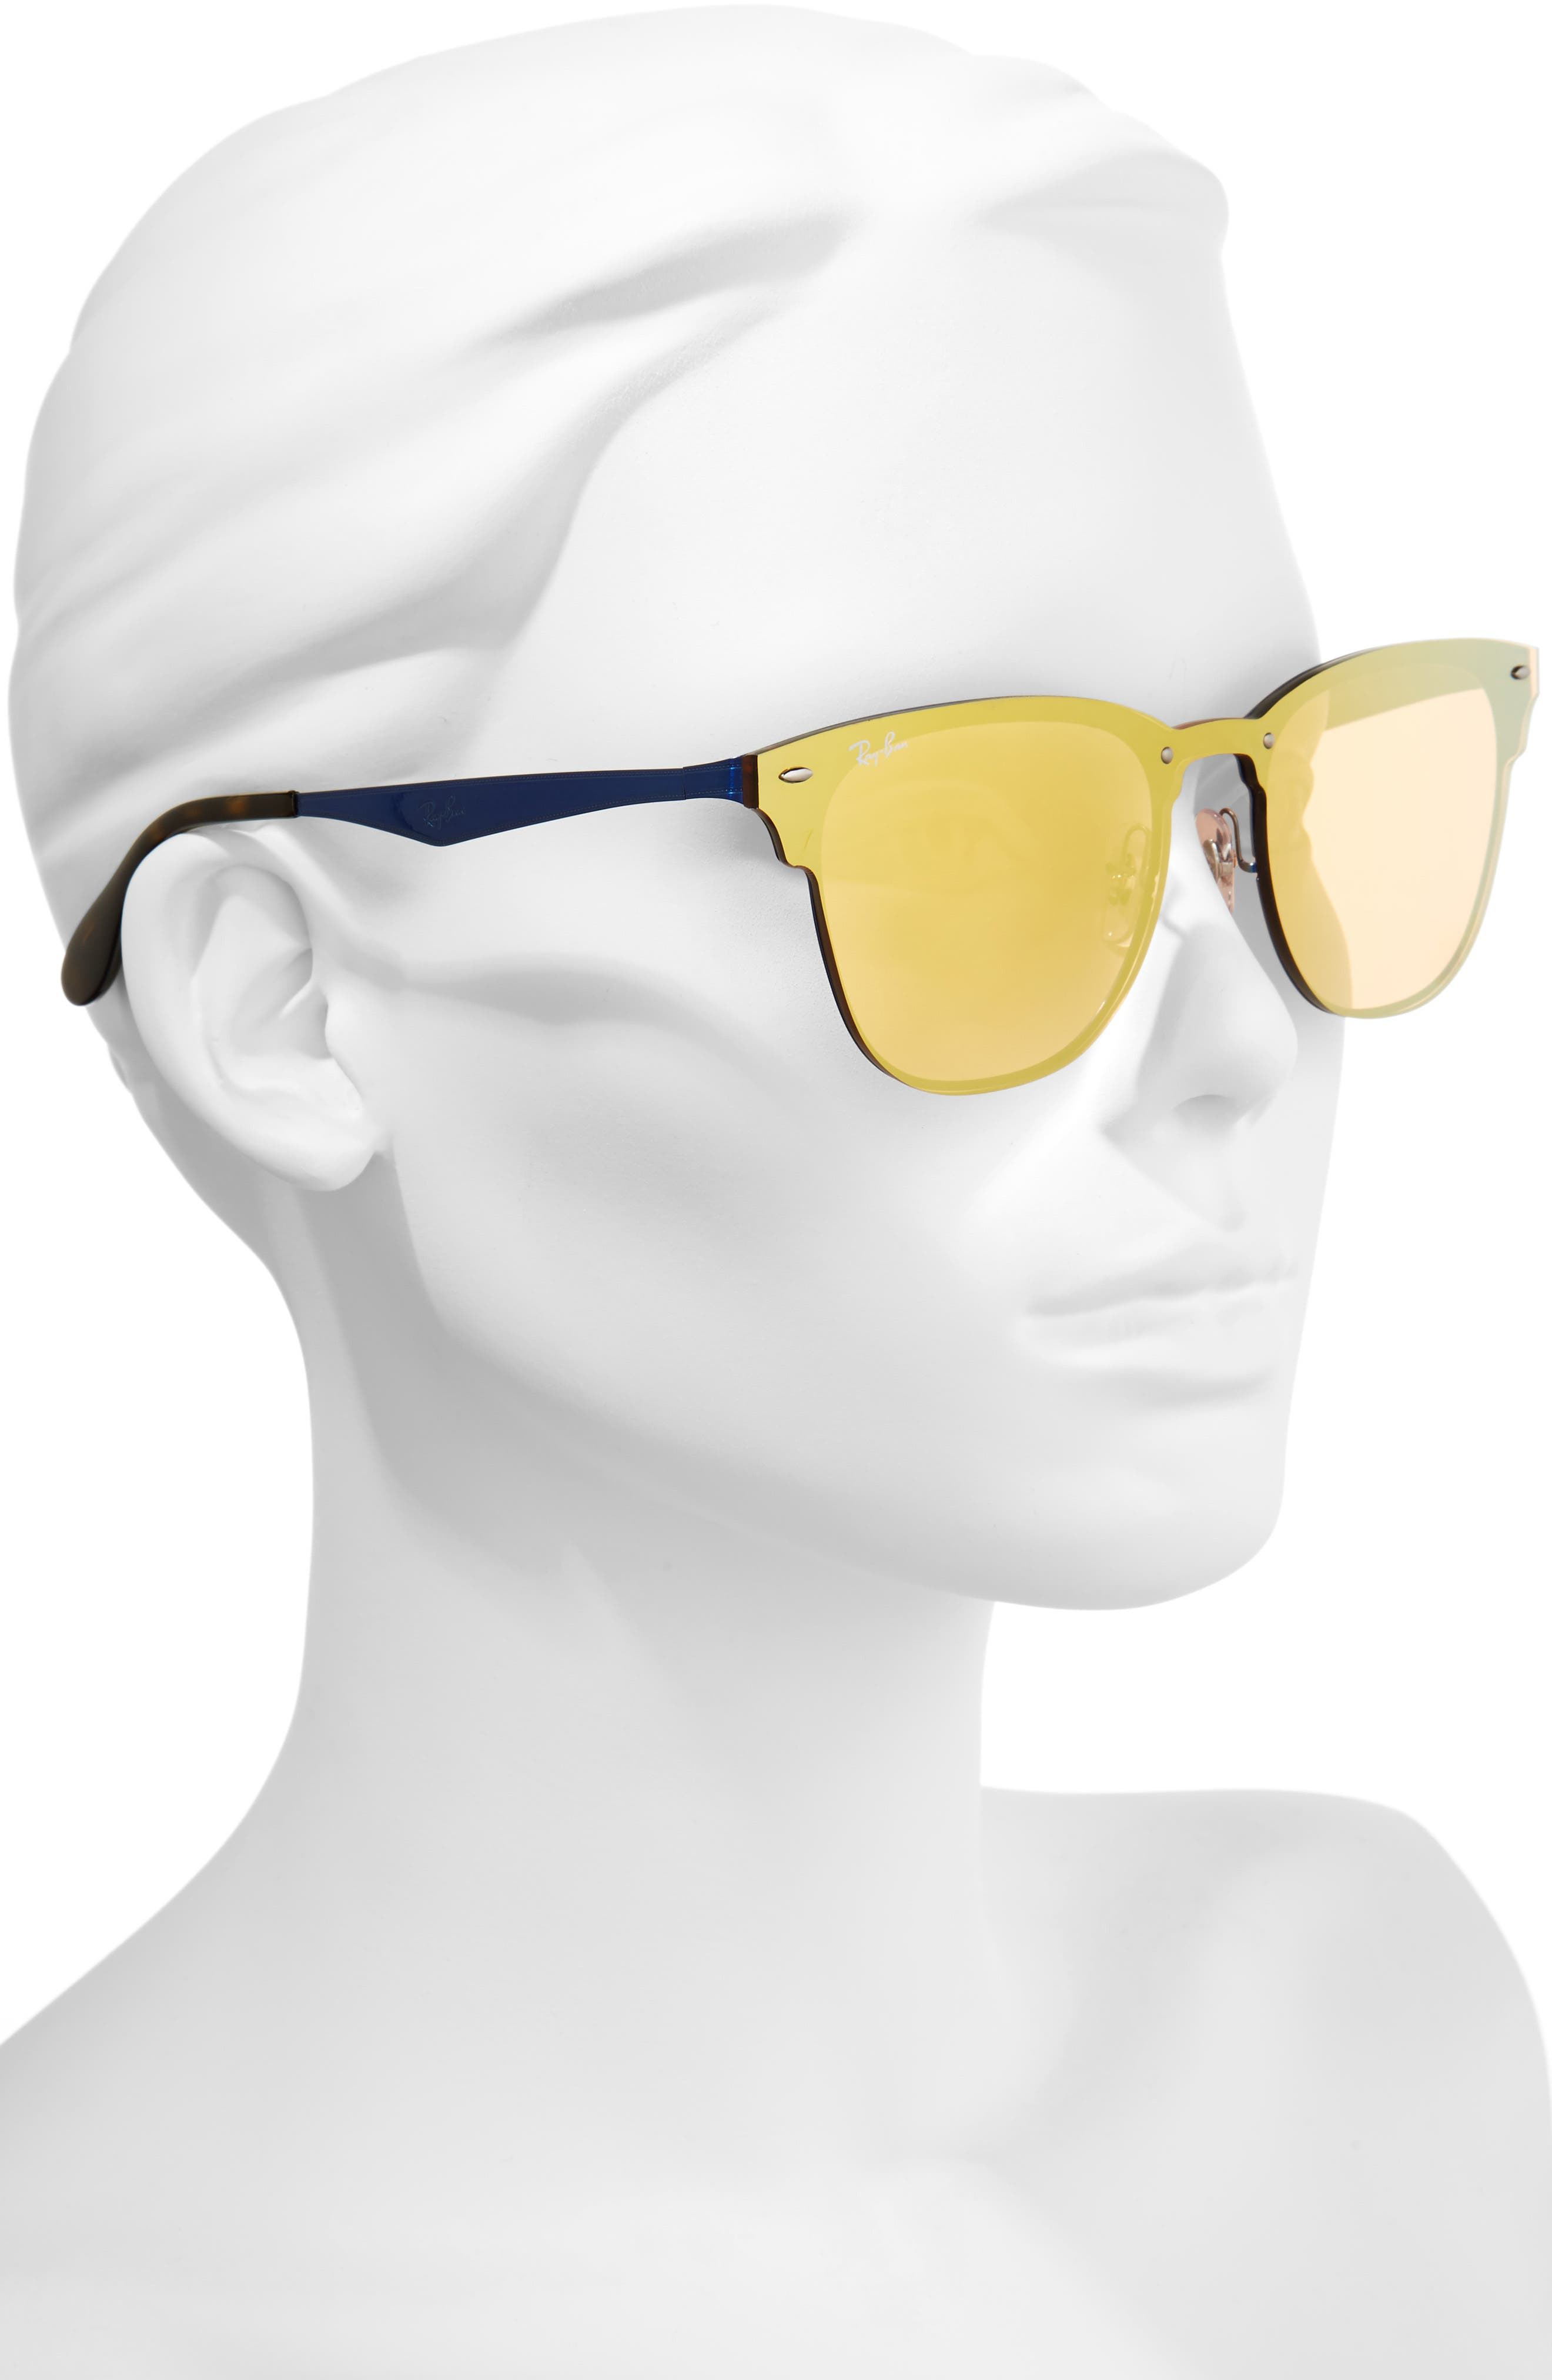 Alternate Image 3  - Ray-Ban 52mm Mirrored Sunglasses